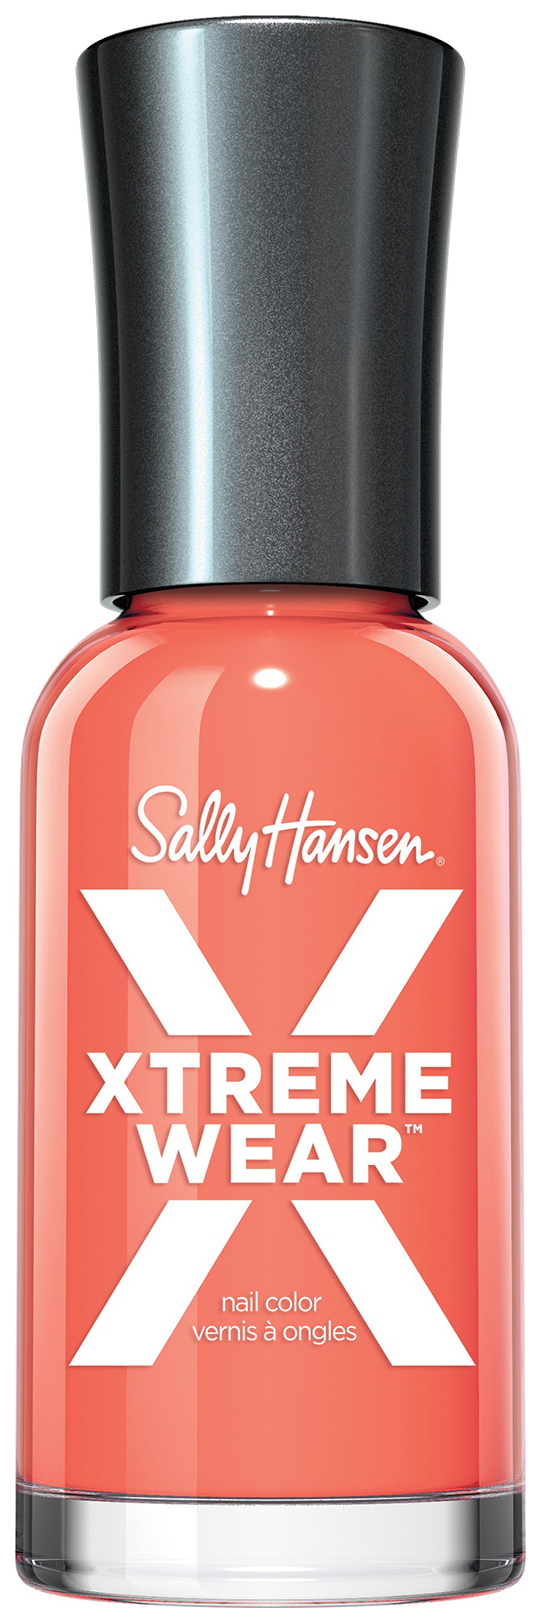 Лак для ногтей Sally Hansen Xtreme Wear Nail Color 328 Pixie Peach 11,8 мл